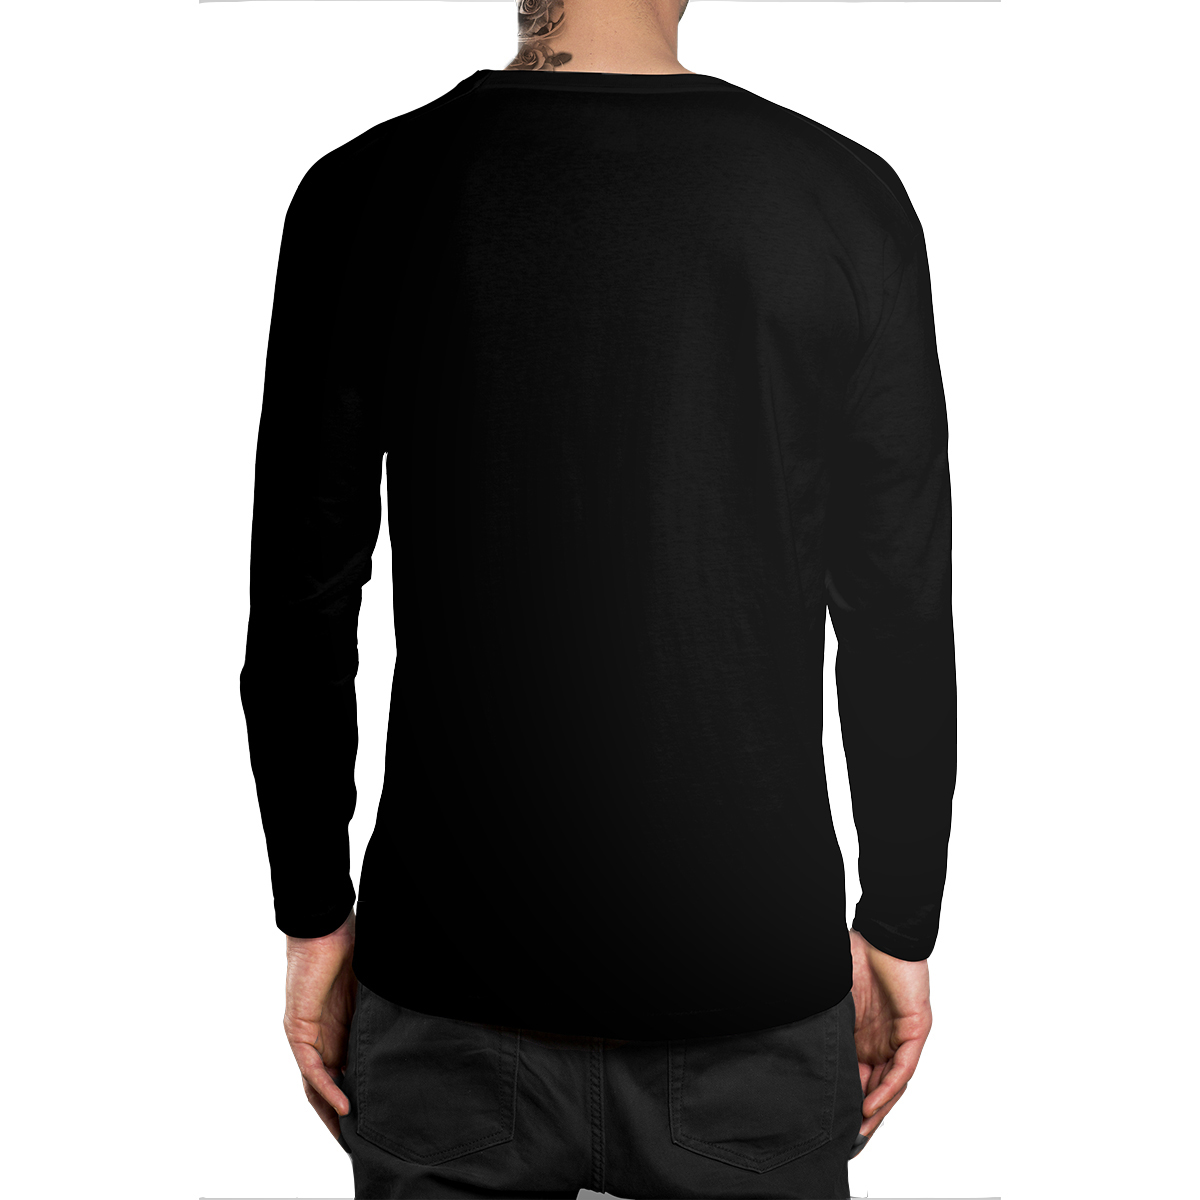 Stompy Camiseta Manga Longa Modelo 12